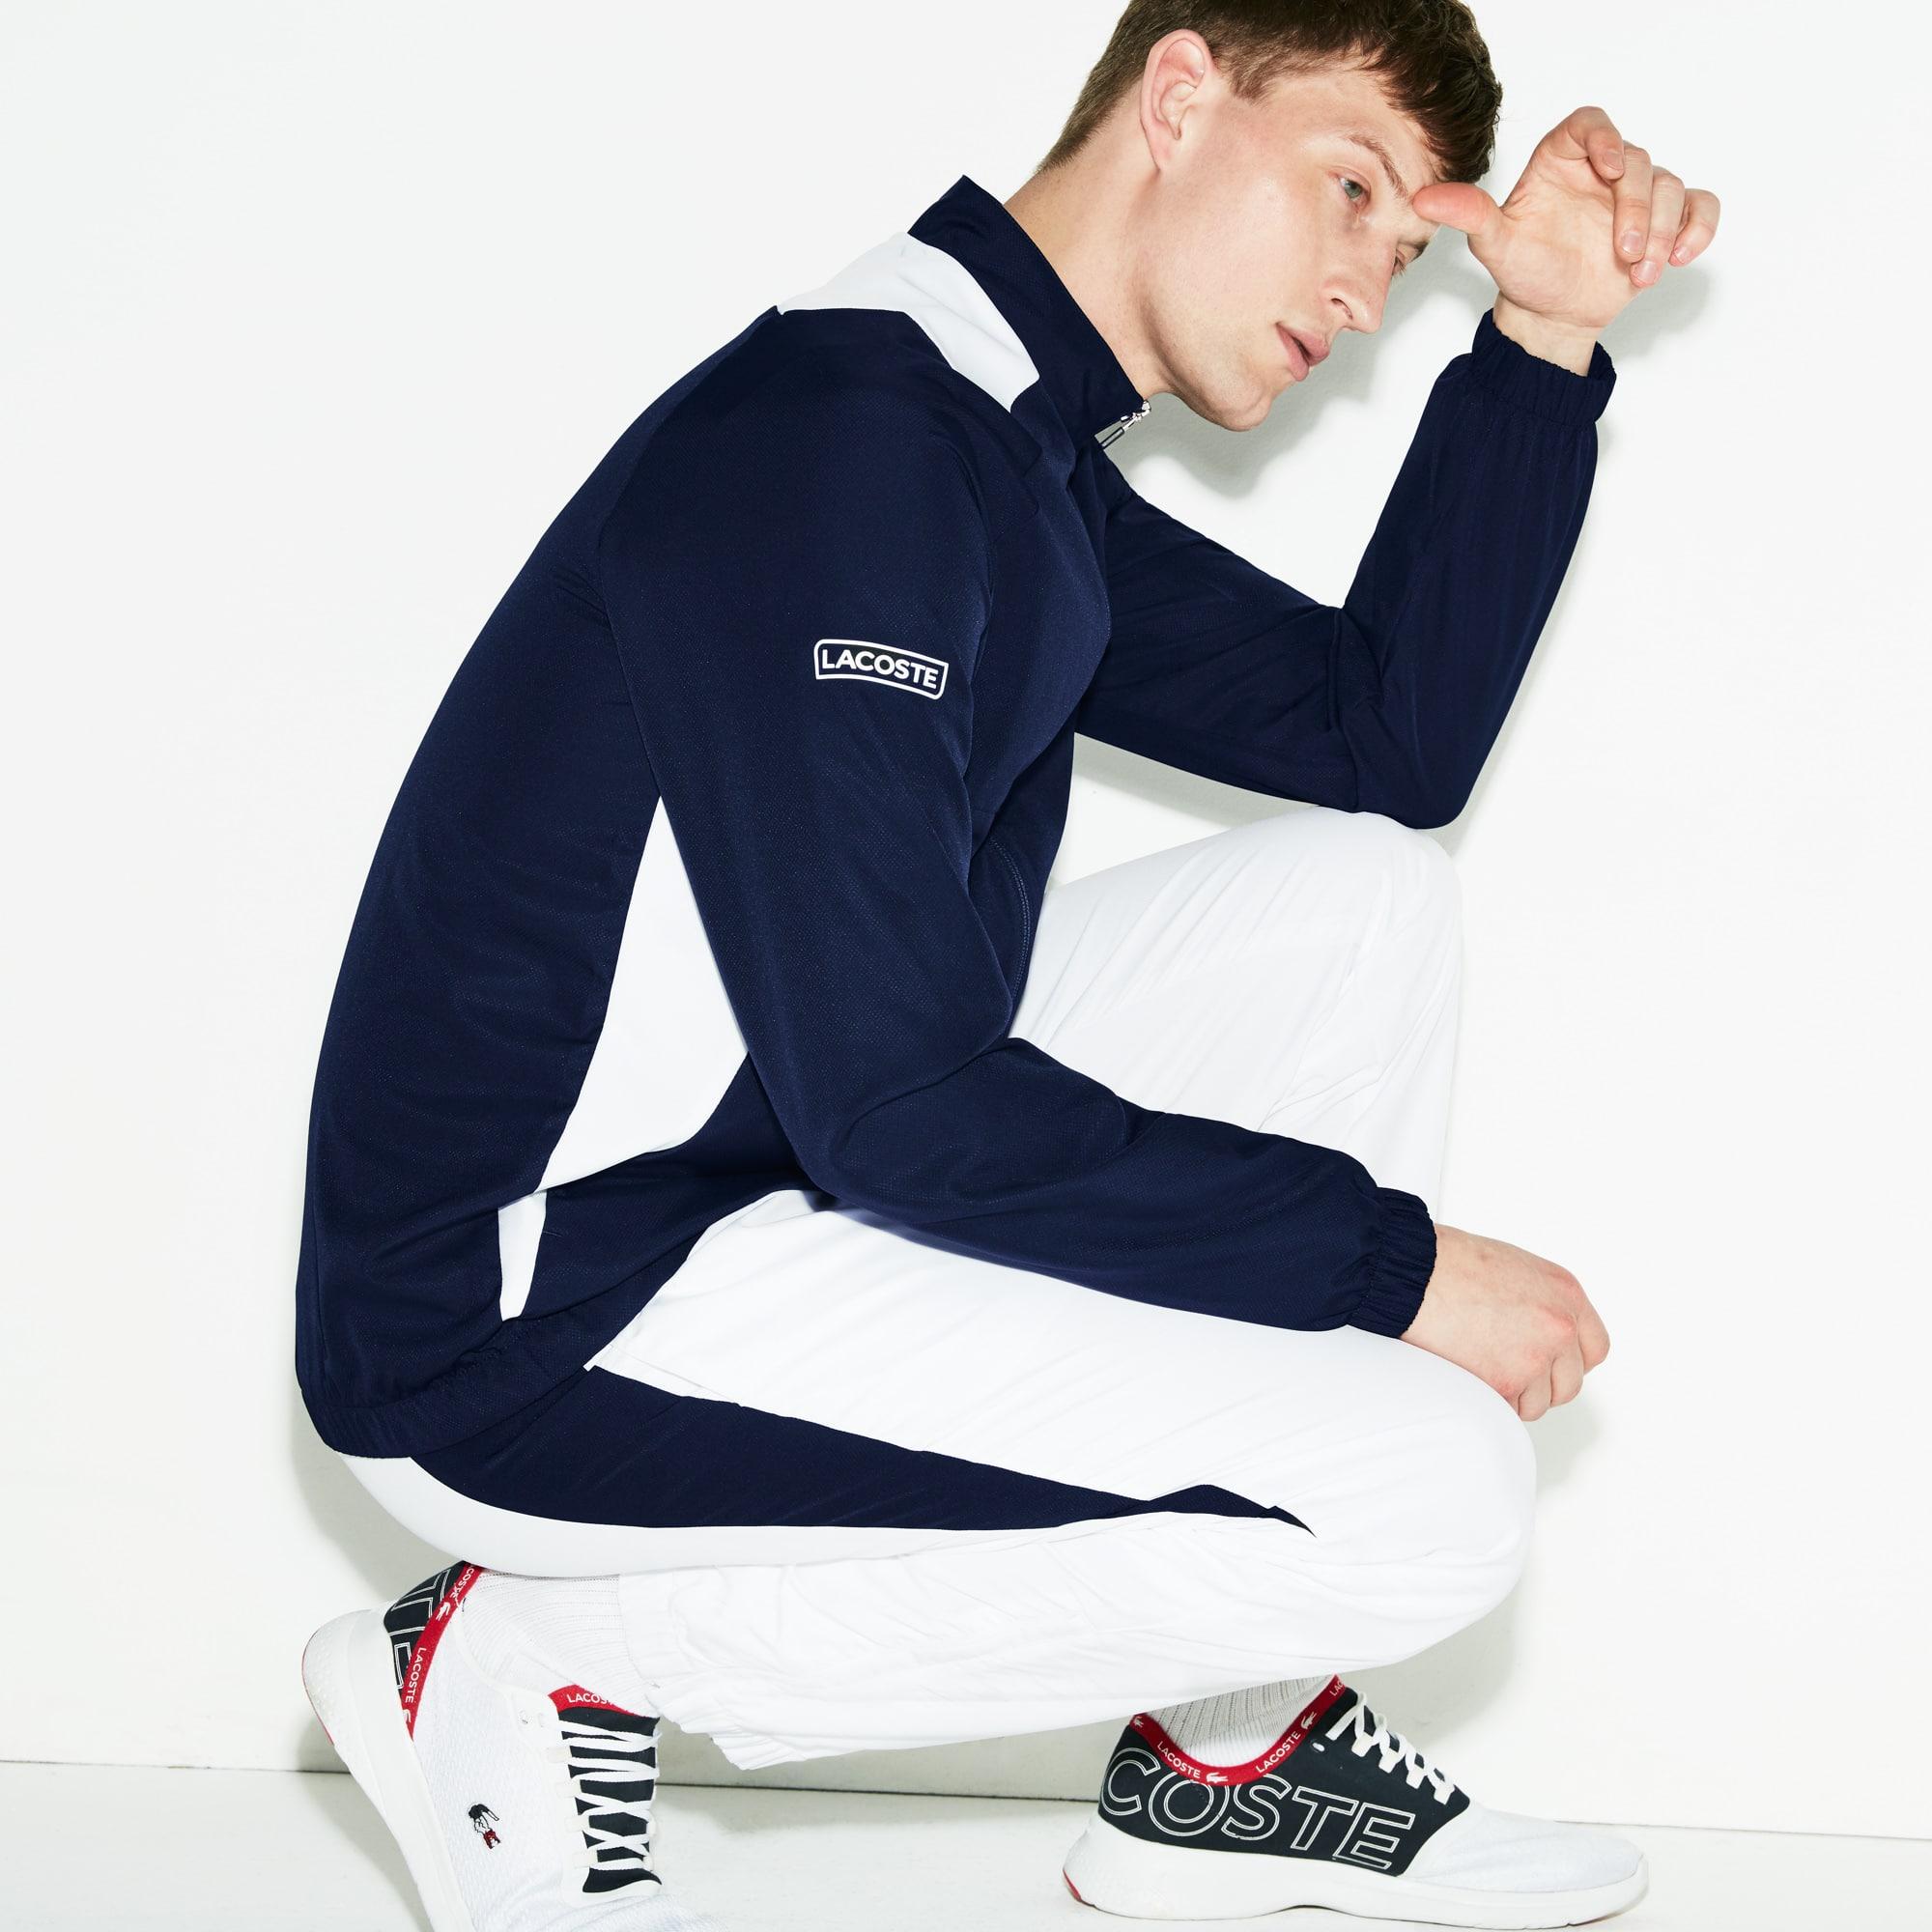 422c9ff1583691 Sports Clothing for Men   Women